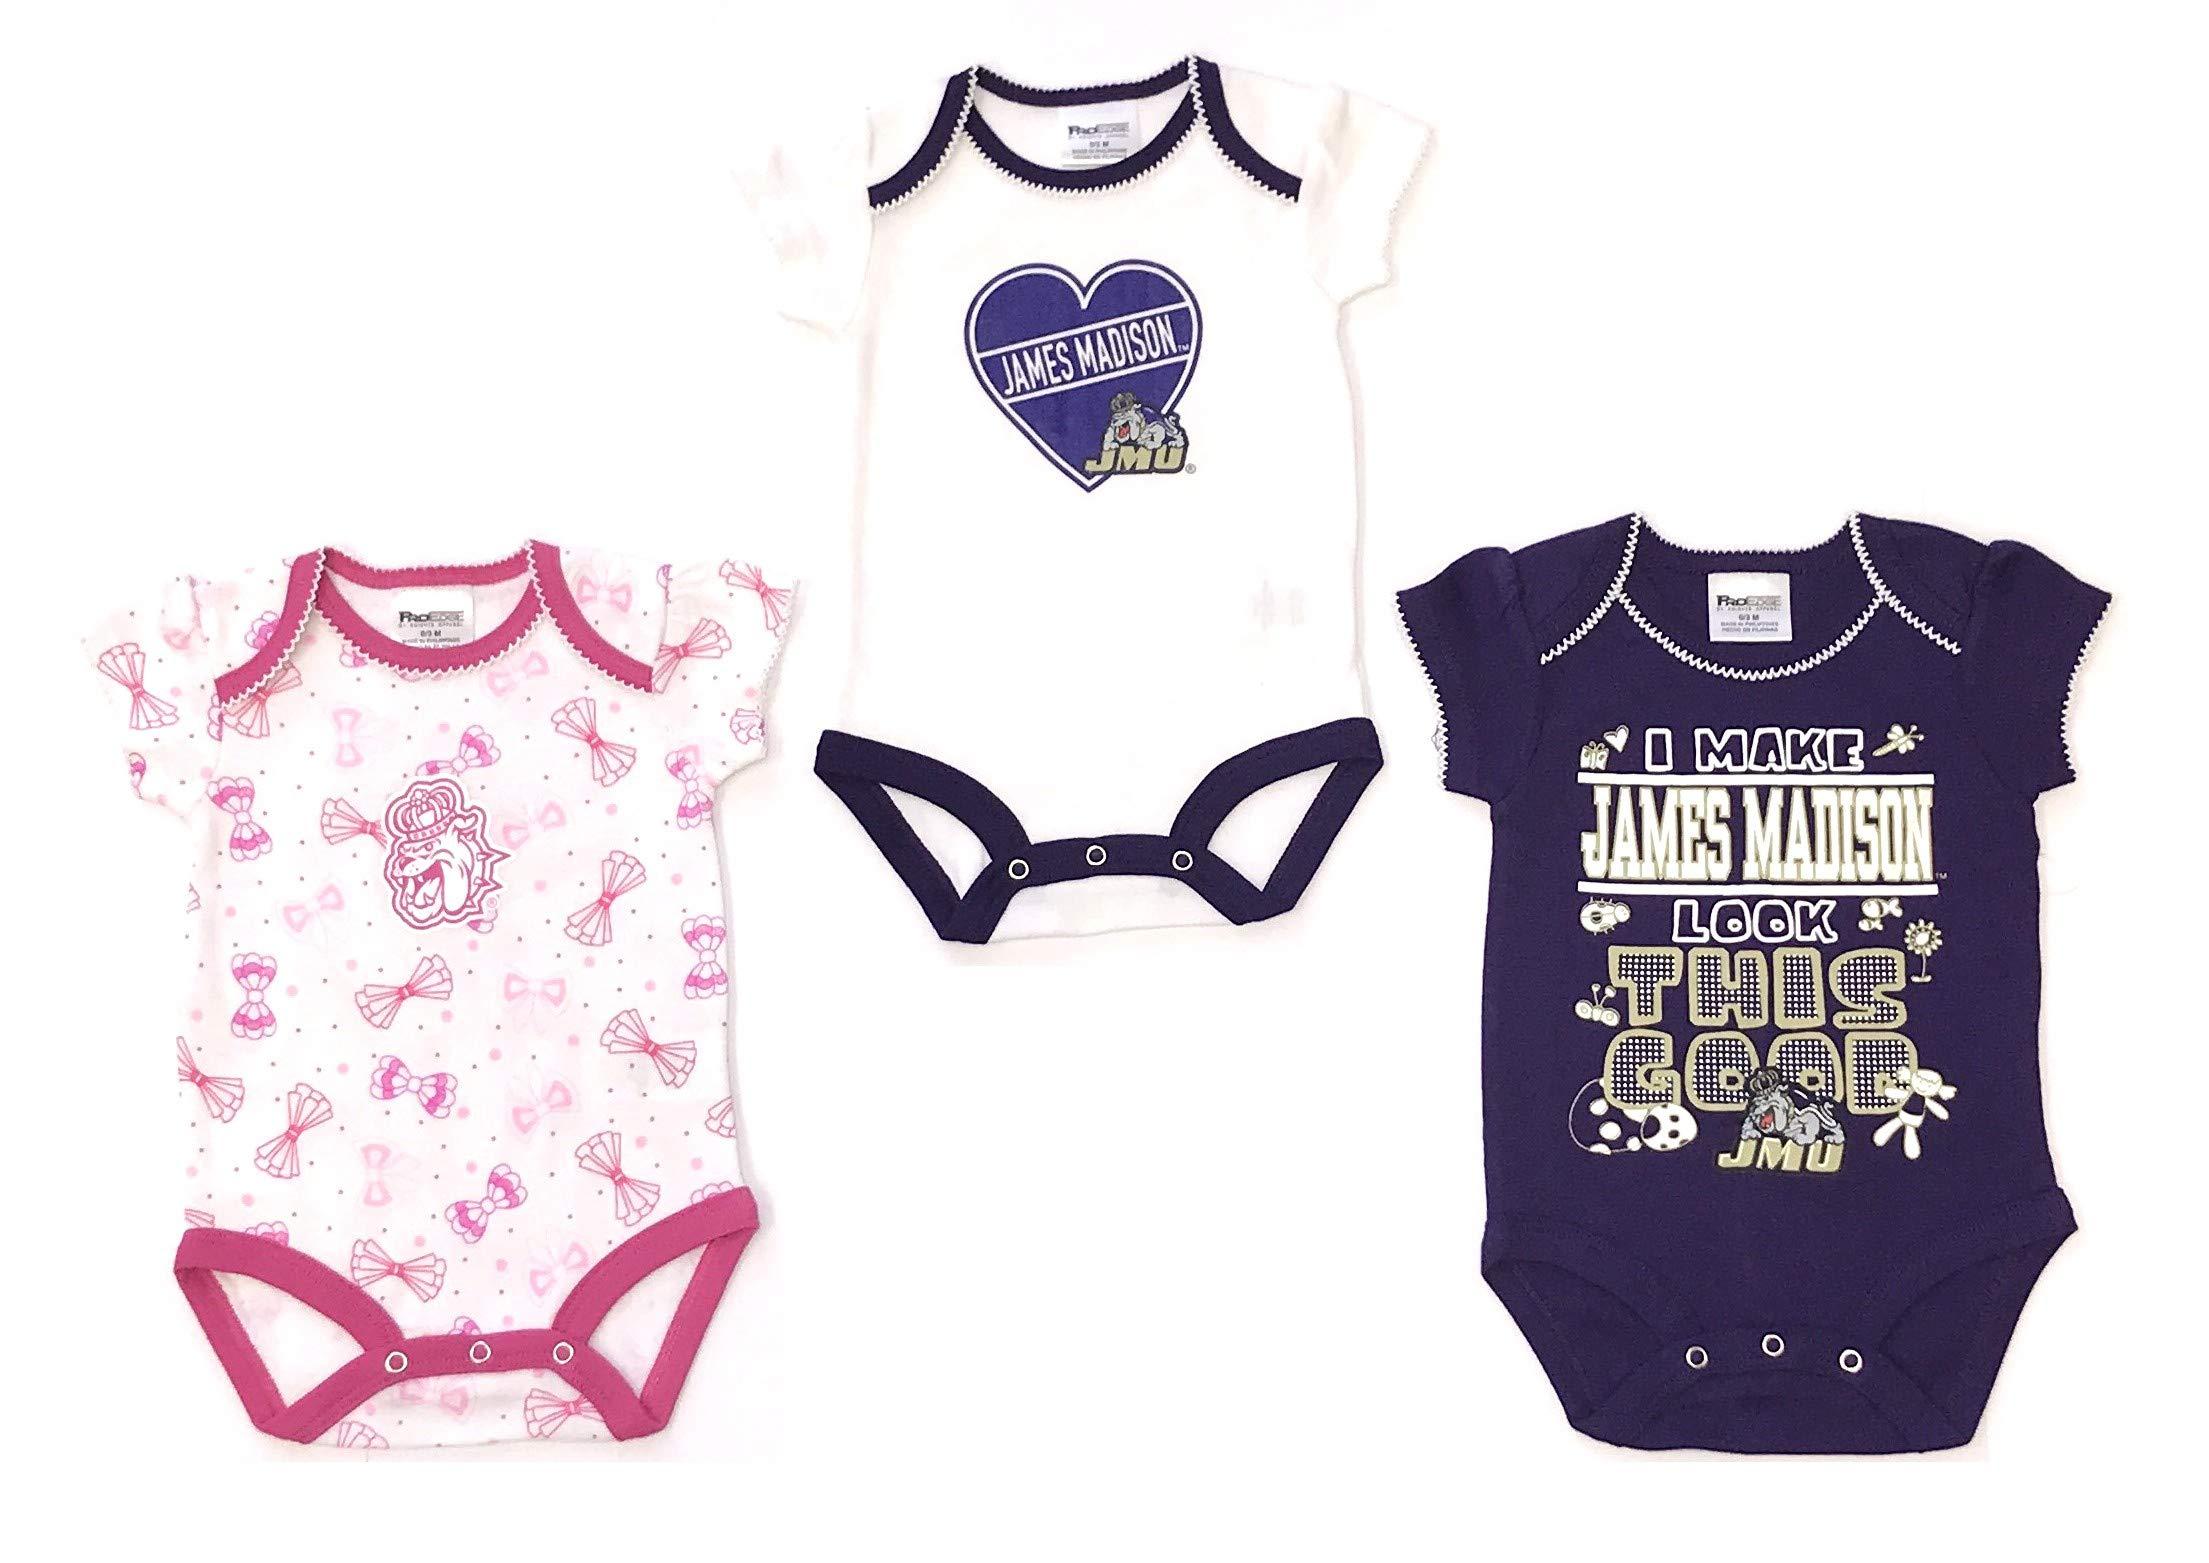 James Madison University Baby Fan Gear 3pc Cotton Envelope Neck Bodysuit - 9 Months, Purple, James Madison University